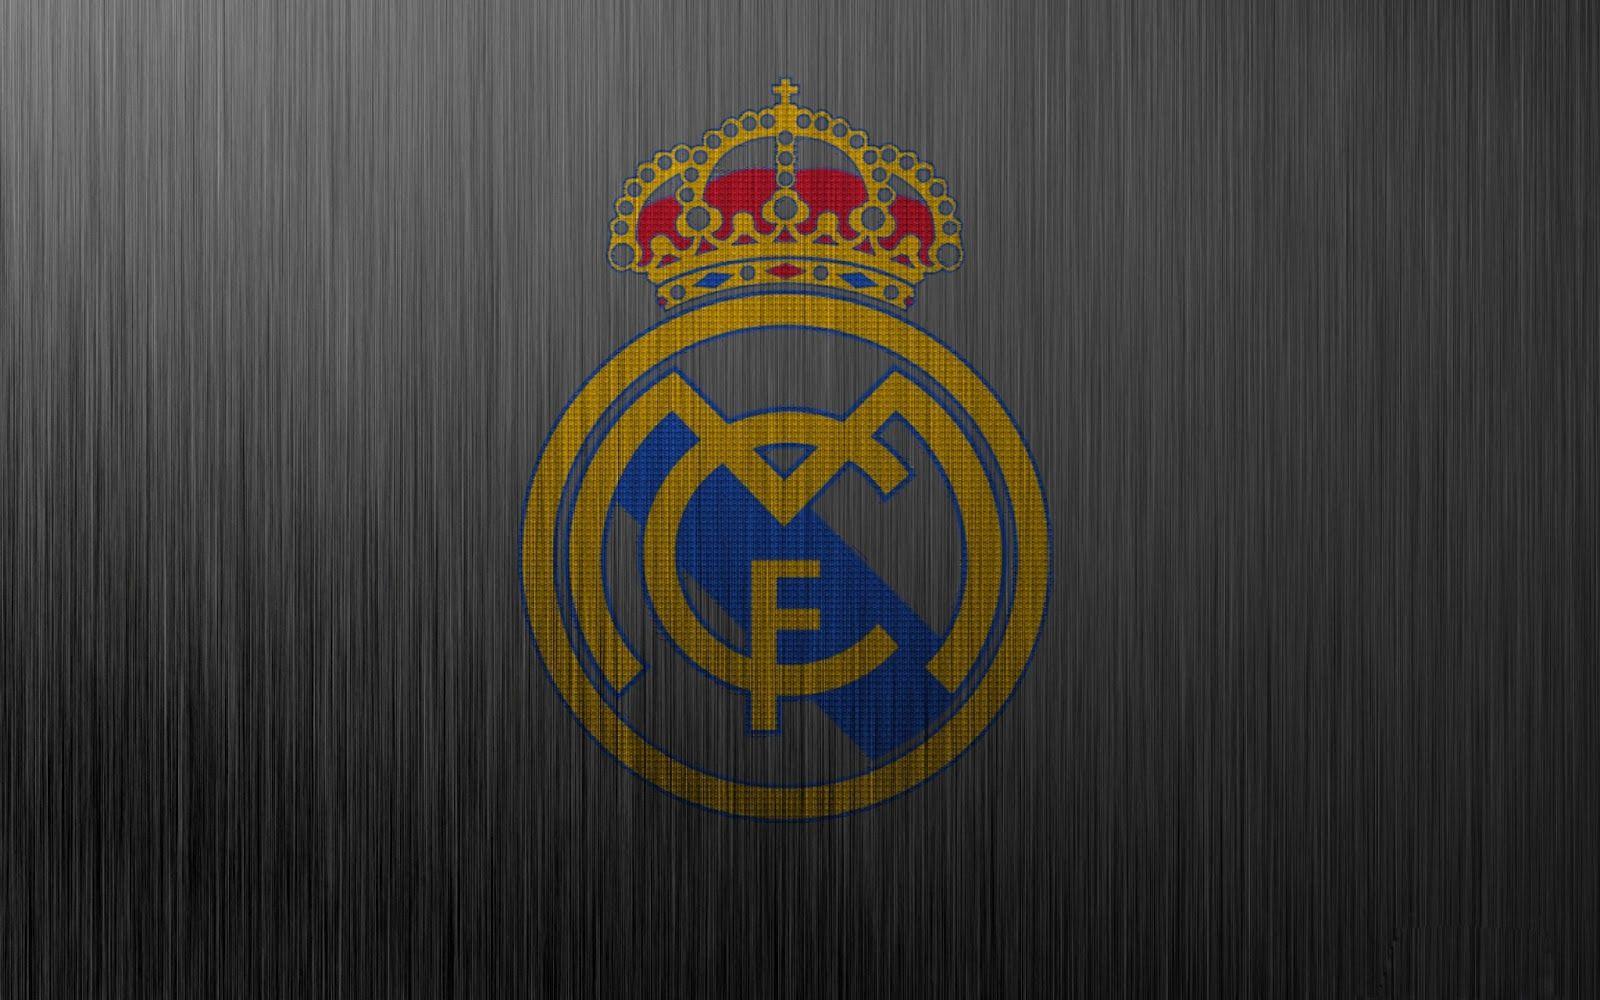 Real madrid fc logo 2013 hd wallpaper l pinterest - Madrid wallpaper ...